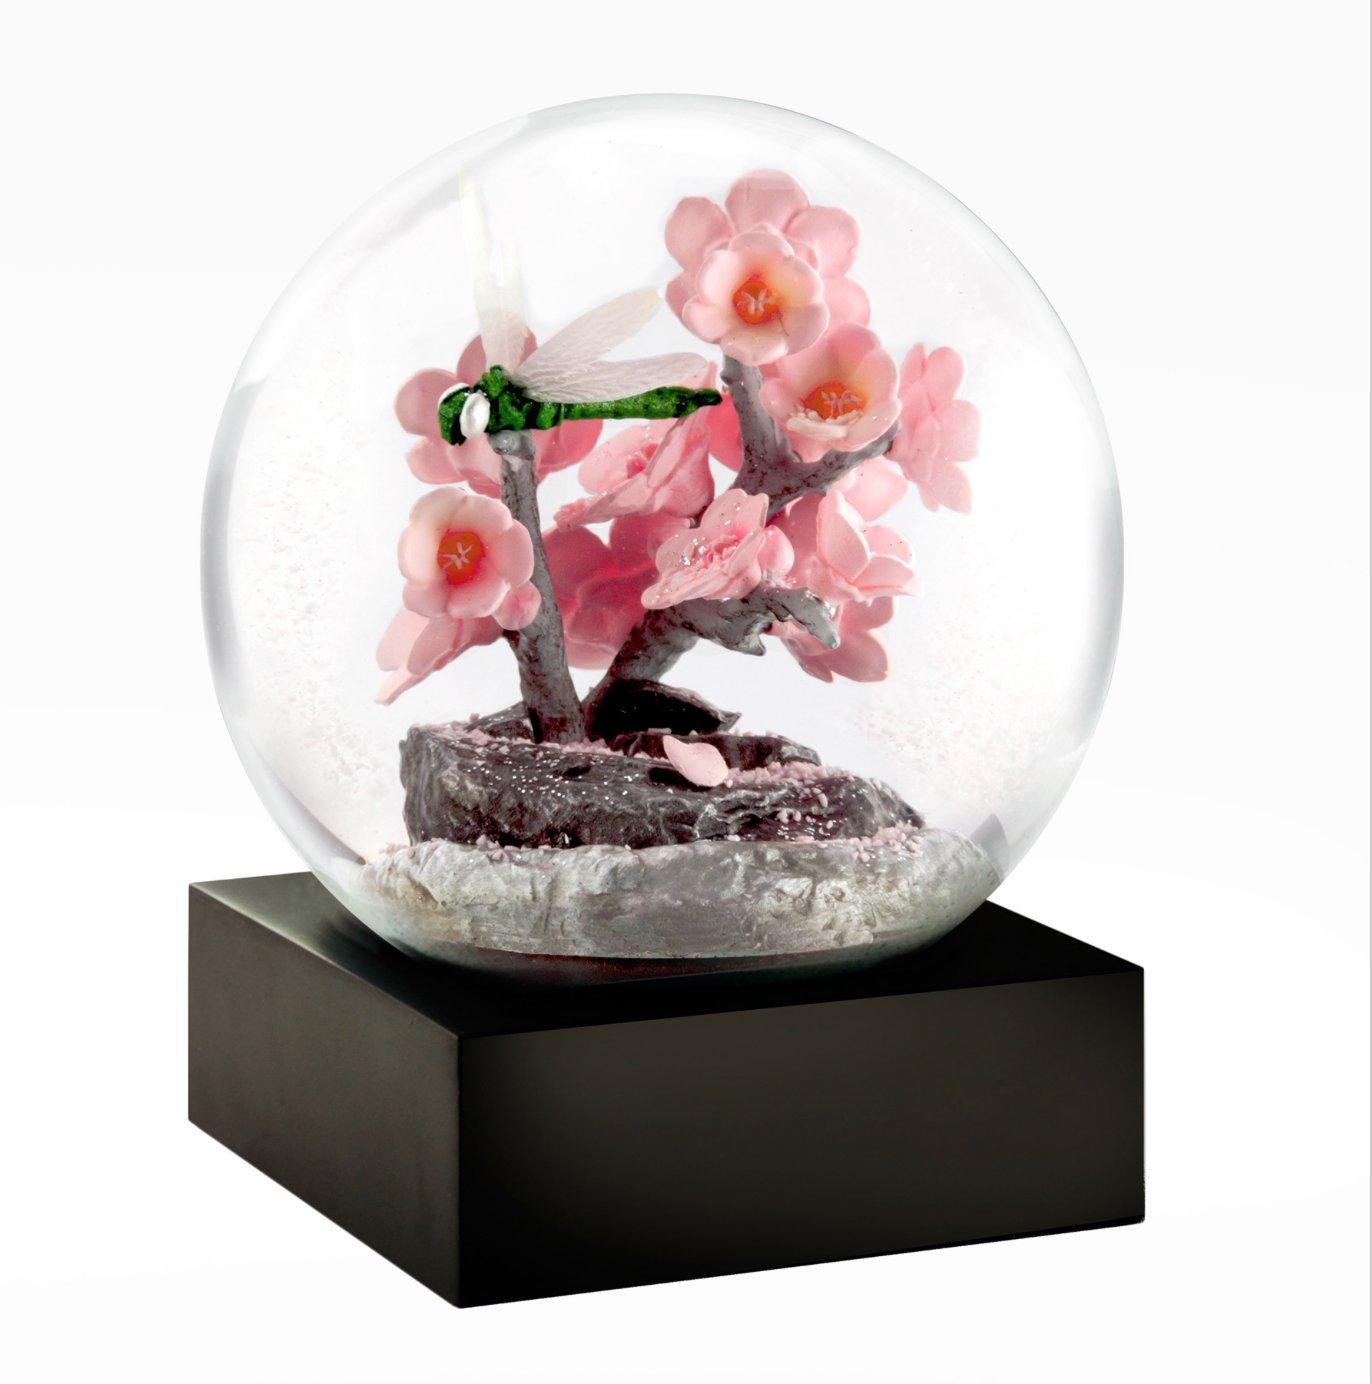 Dragonfly Snow Globe - Floral snow globe